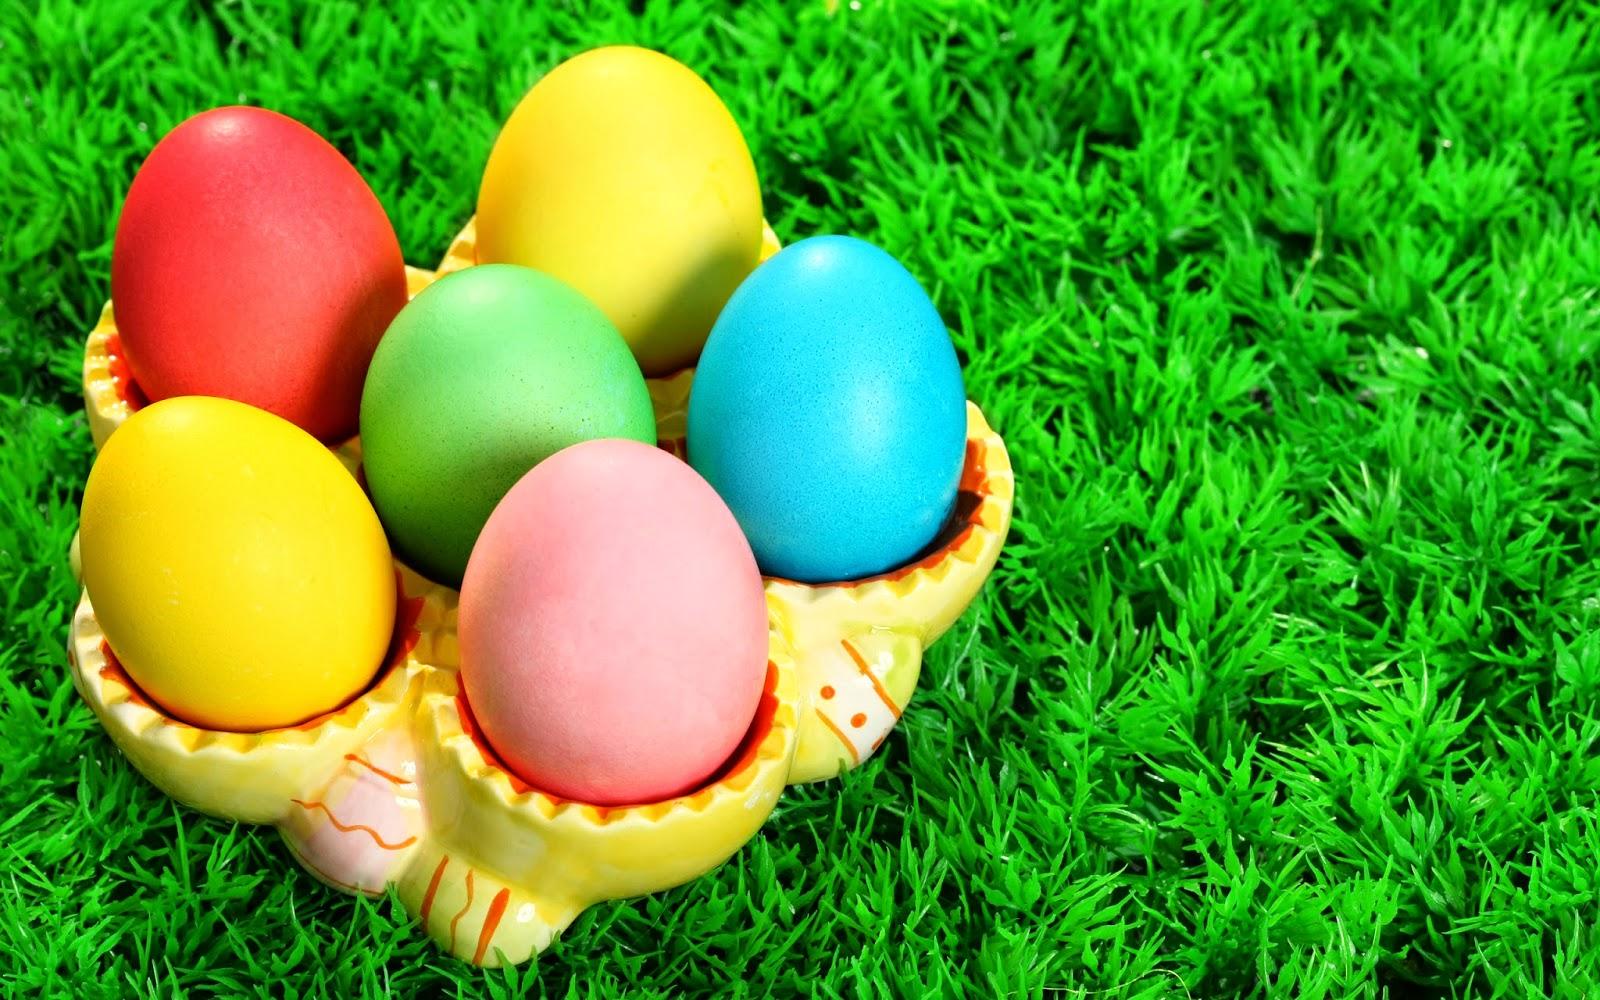 happy easter eggs hd - photo #6